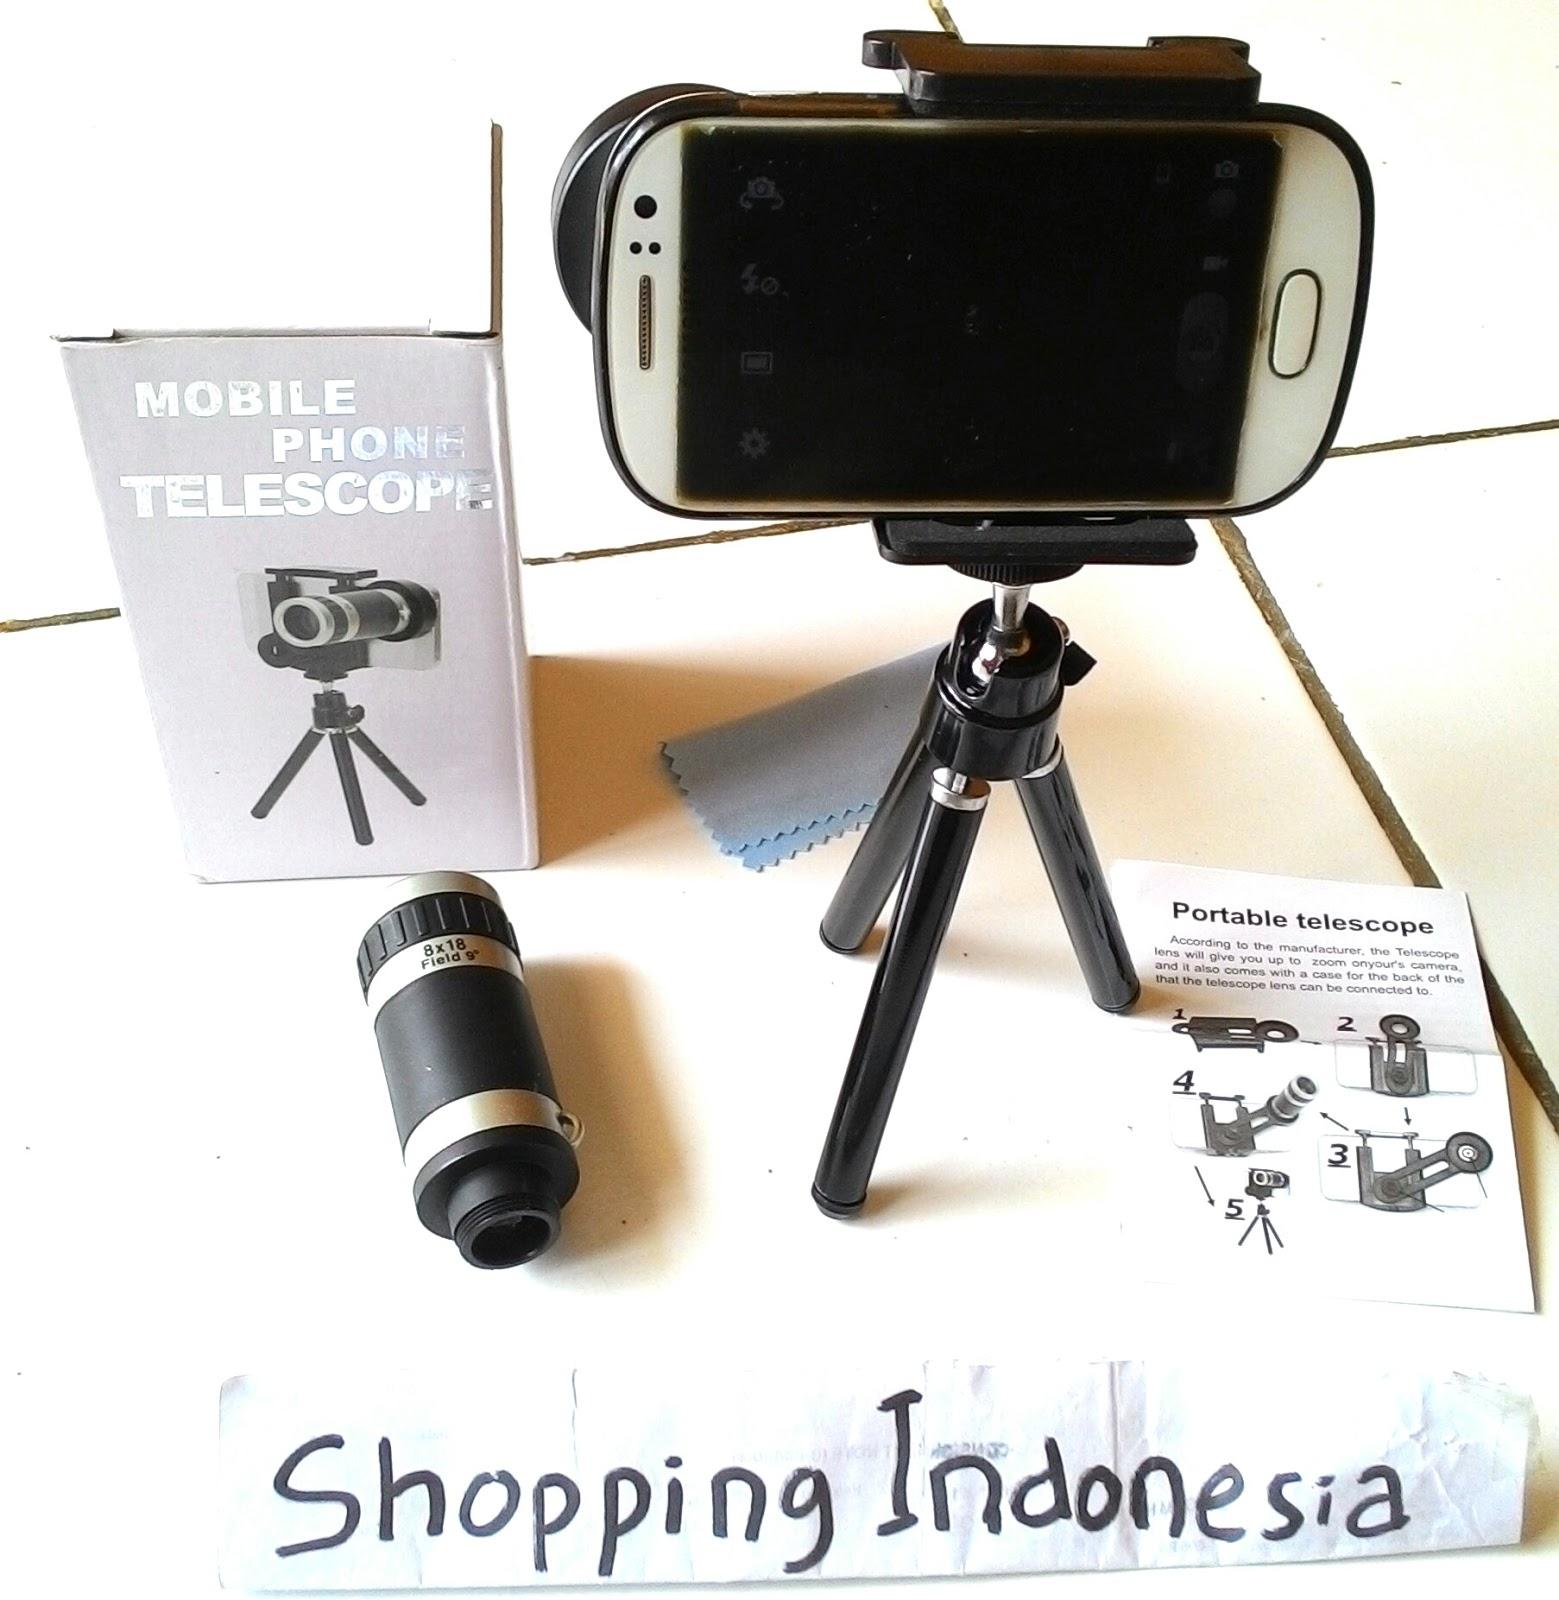 Lensa tele zoom 8x tripod untuk smartphone HP fotography